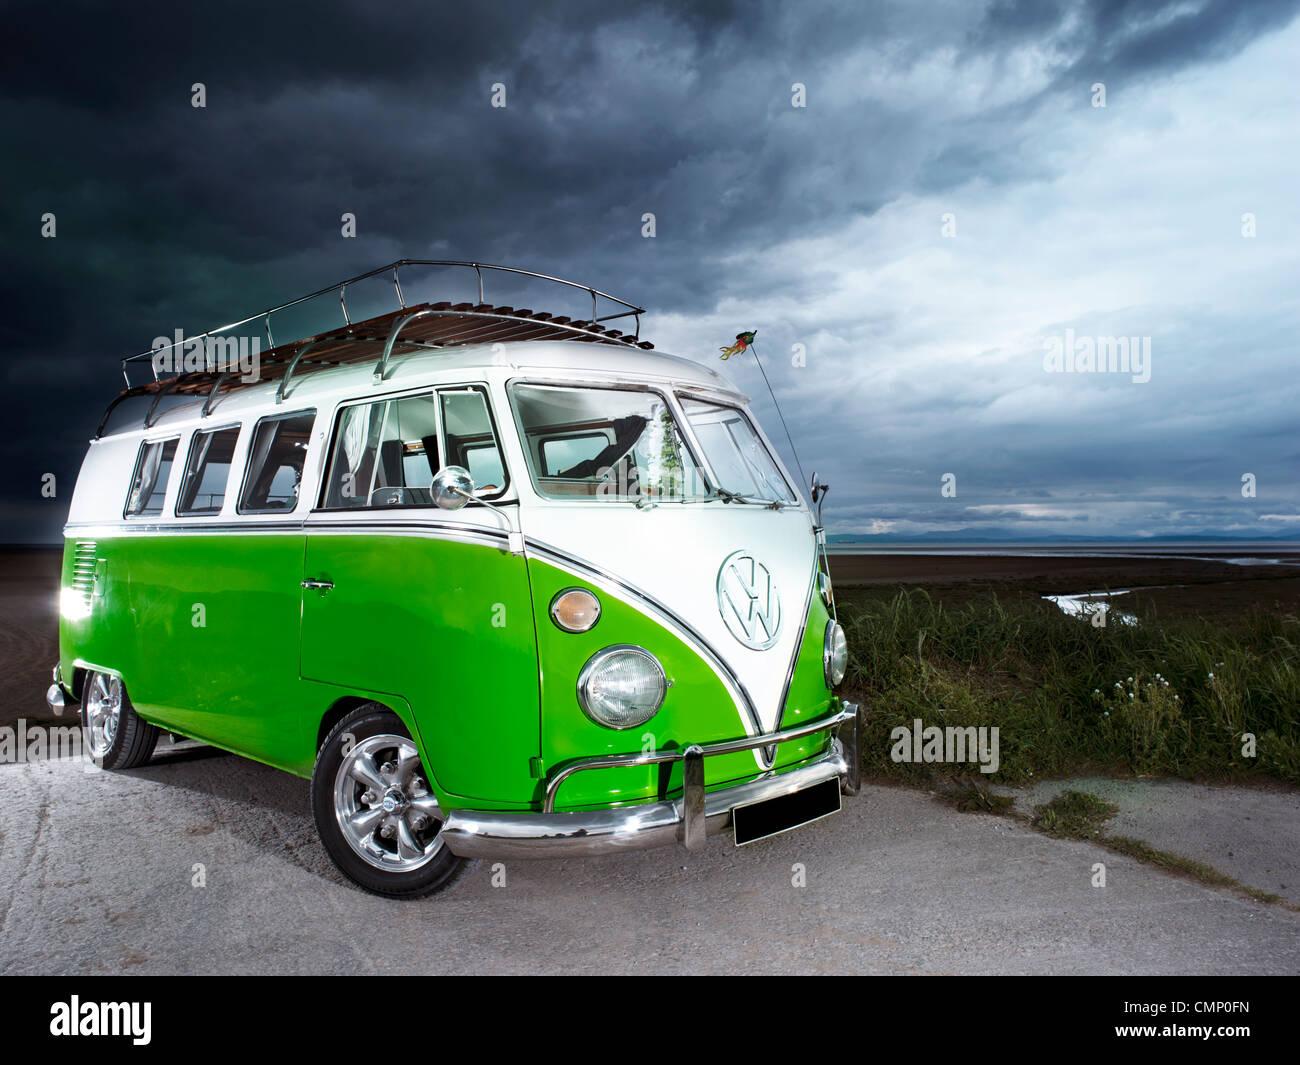 green vw volkswagen split screen camper van bus hippie hippy 1960s stock photo royalty free. Black Bedroom Furniture Sets. Home Design Ideas